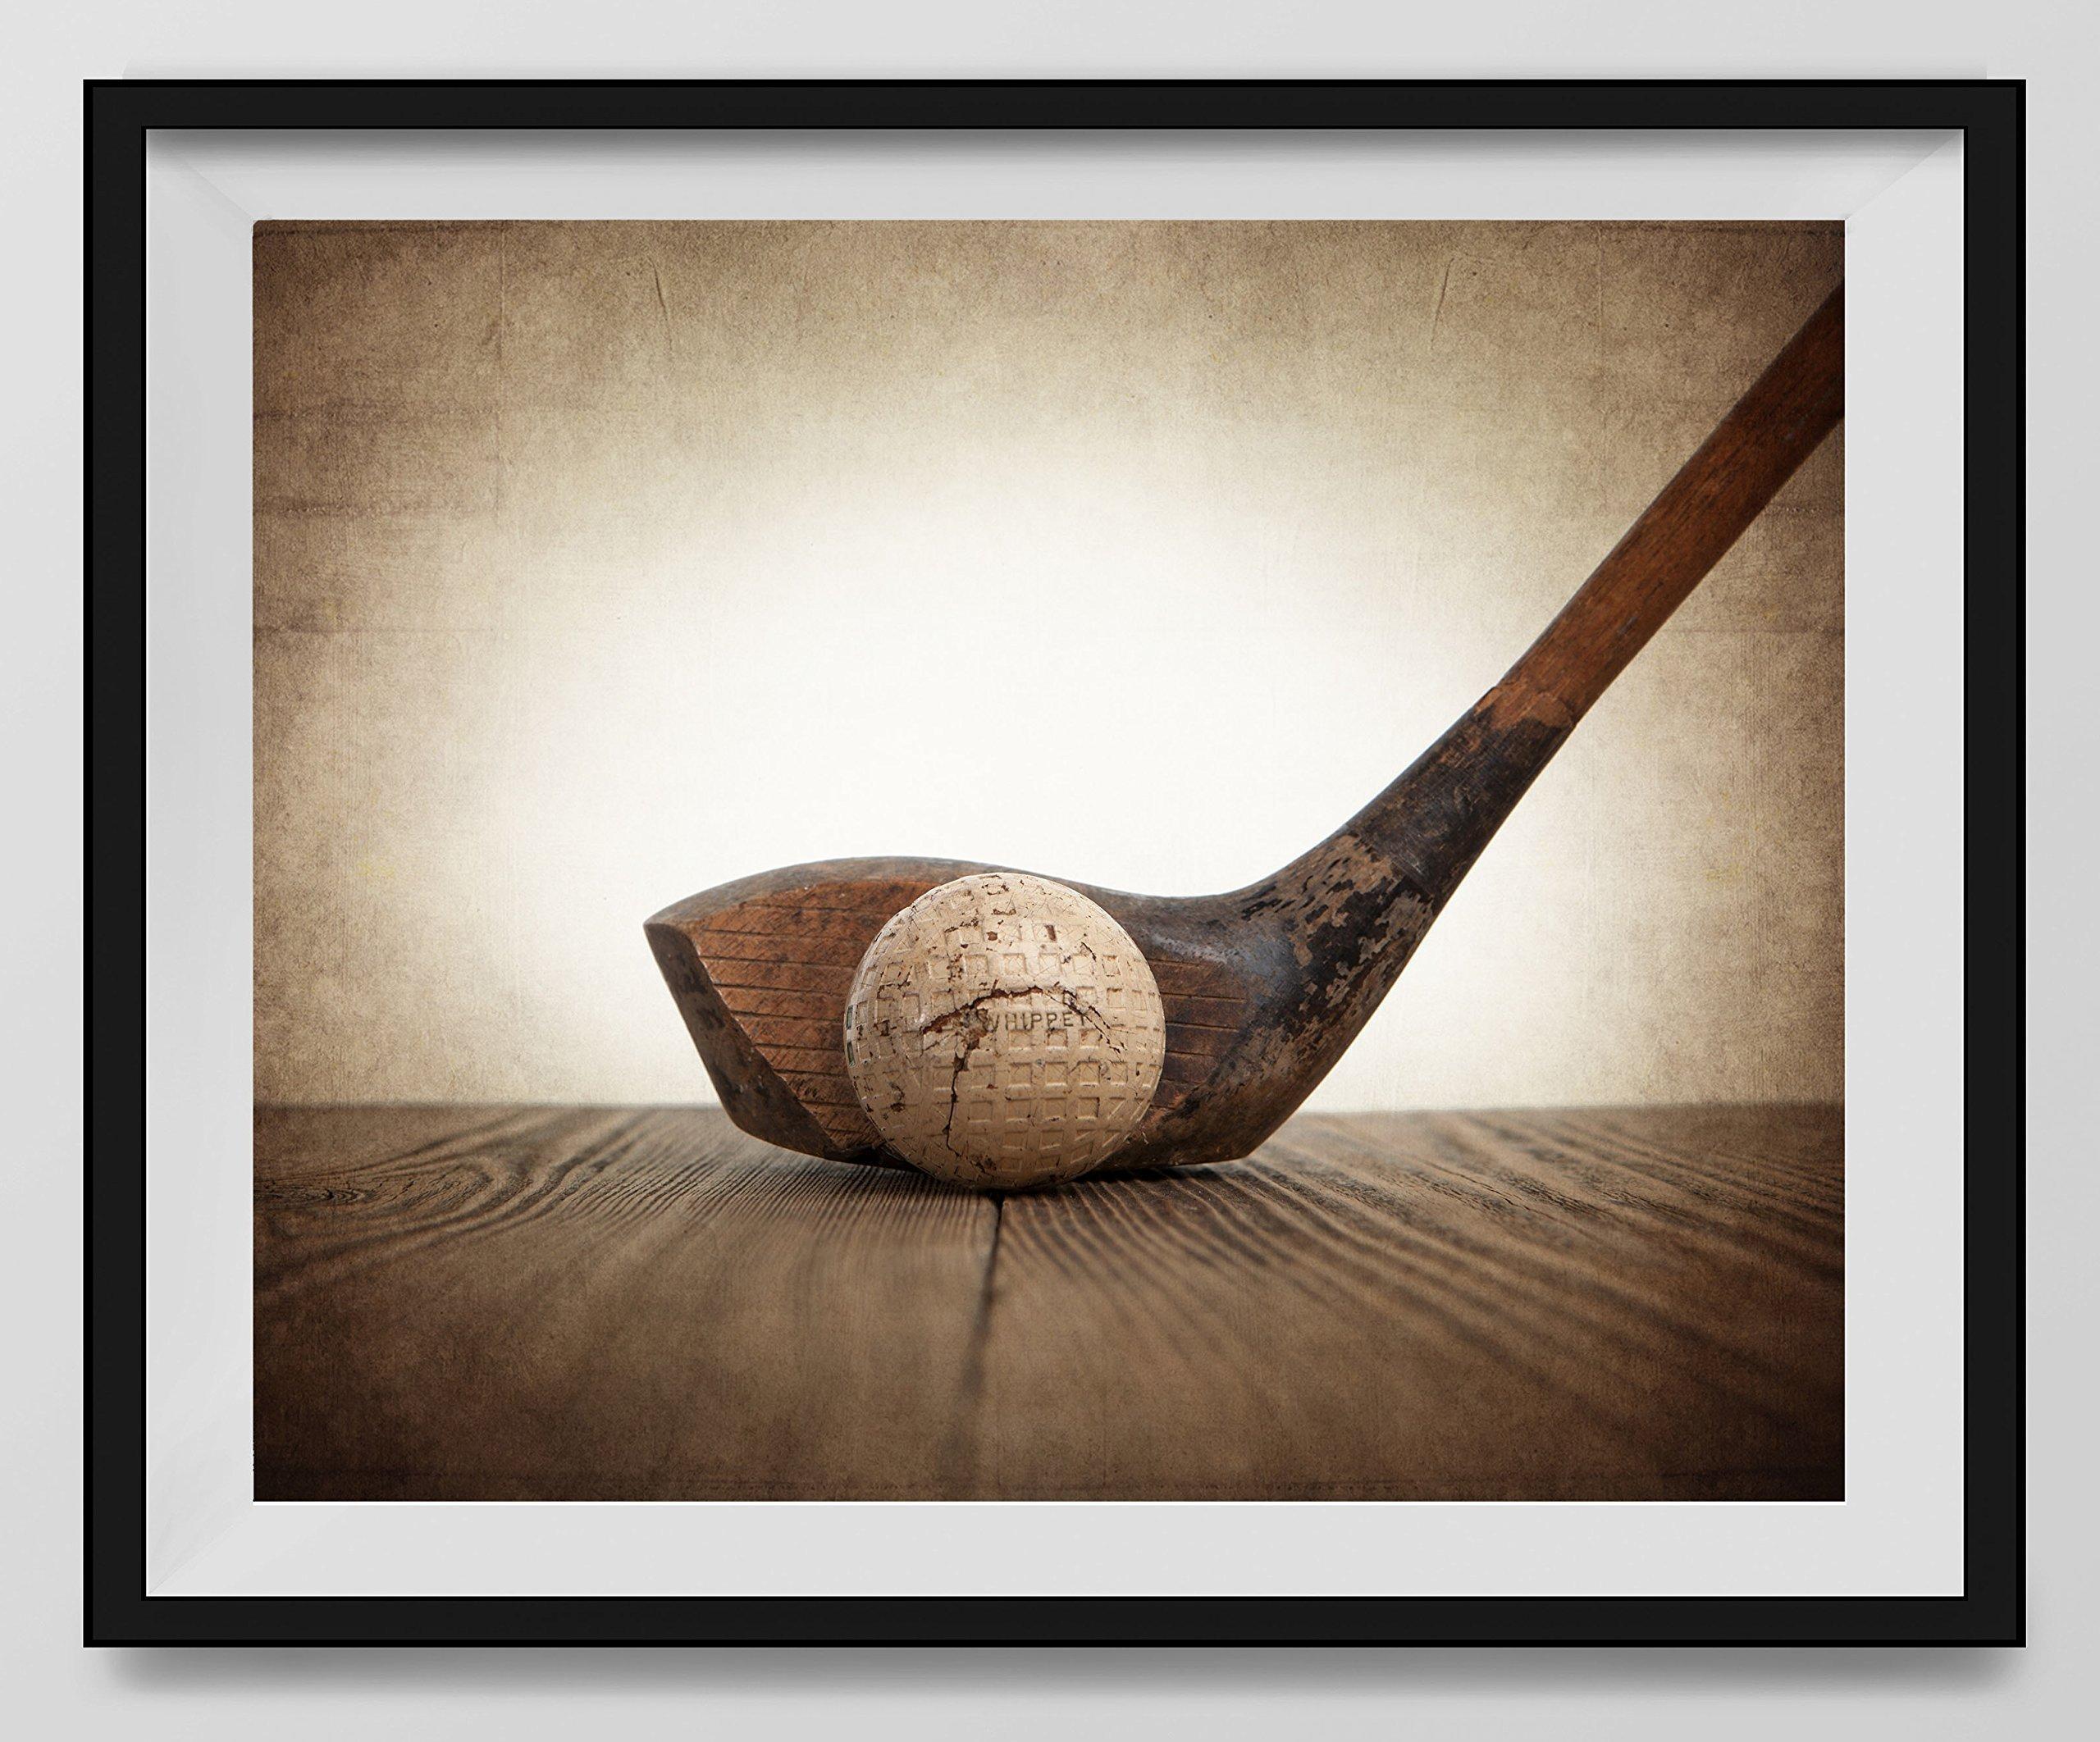 Vintage Golf Wood and Ball on Vintage Background Fine Art Photography Print, Golf Photo, Vintage Golf Artwork